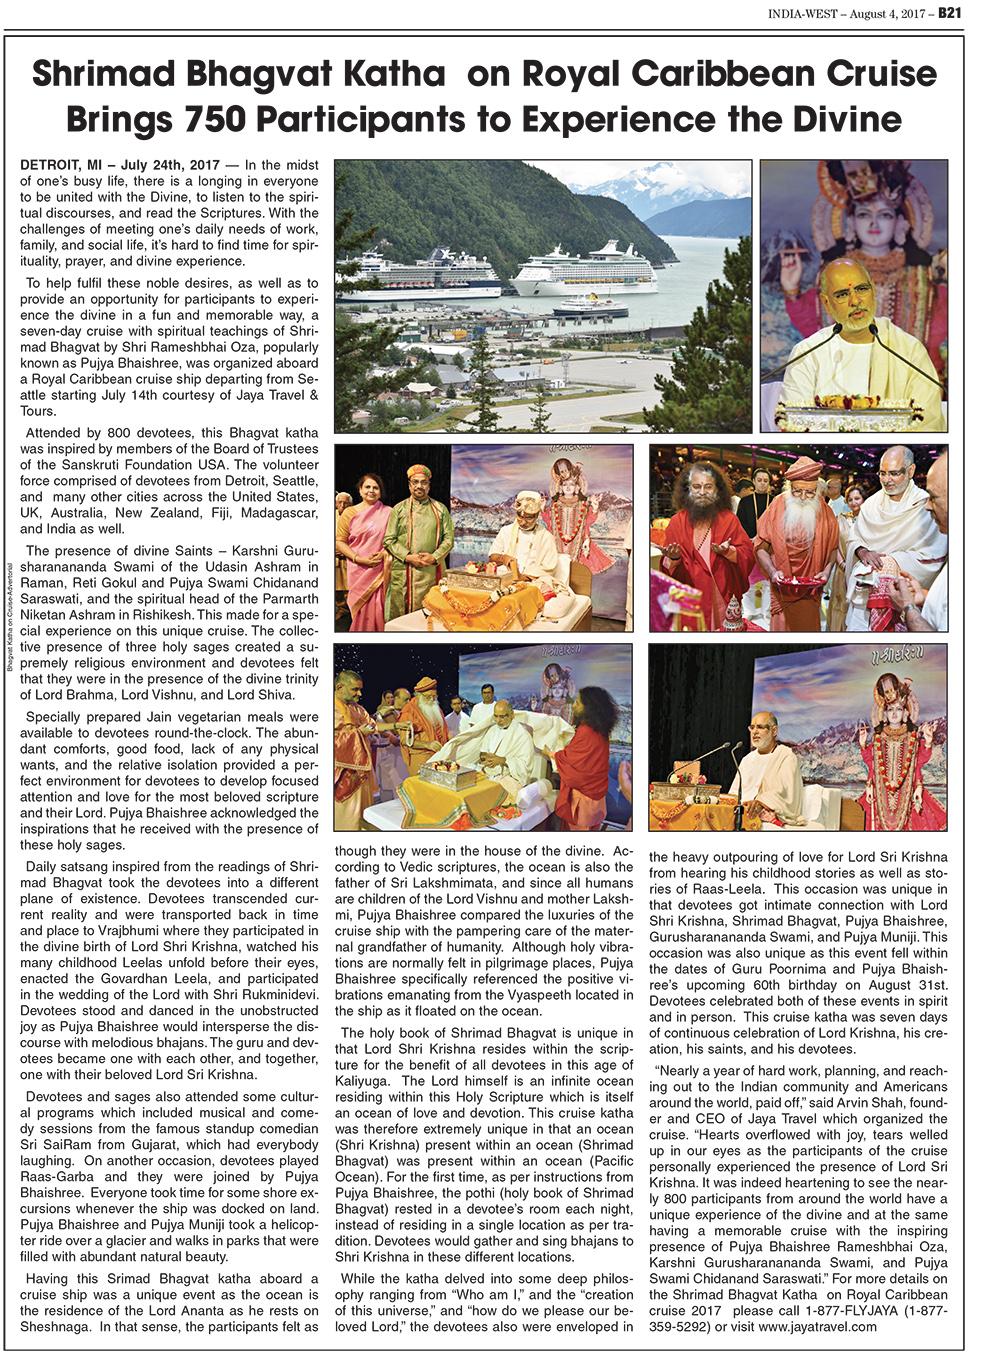 Shrimad Bhagvat Katha 2017